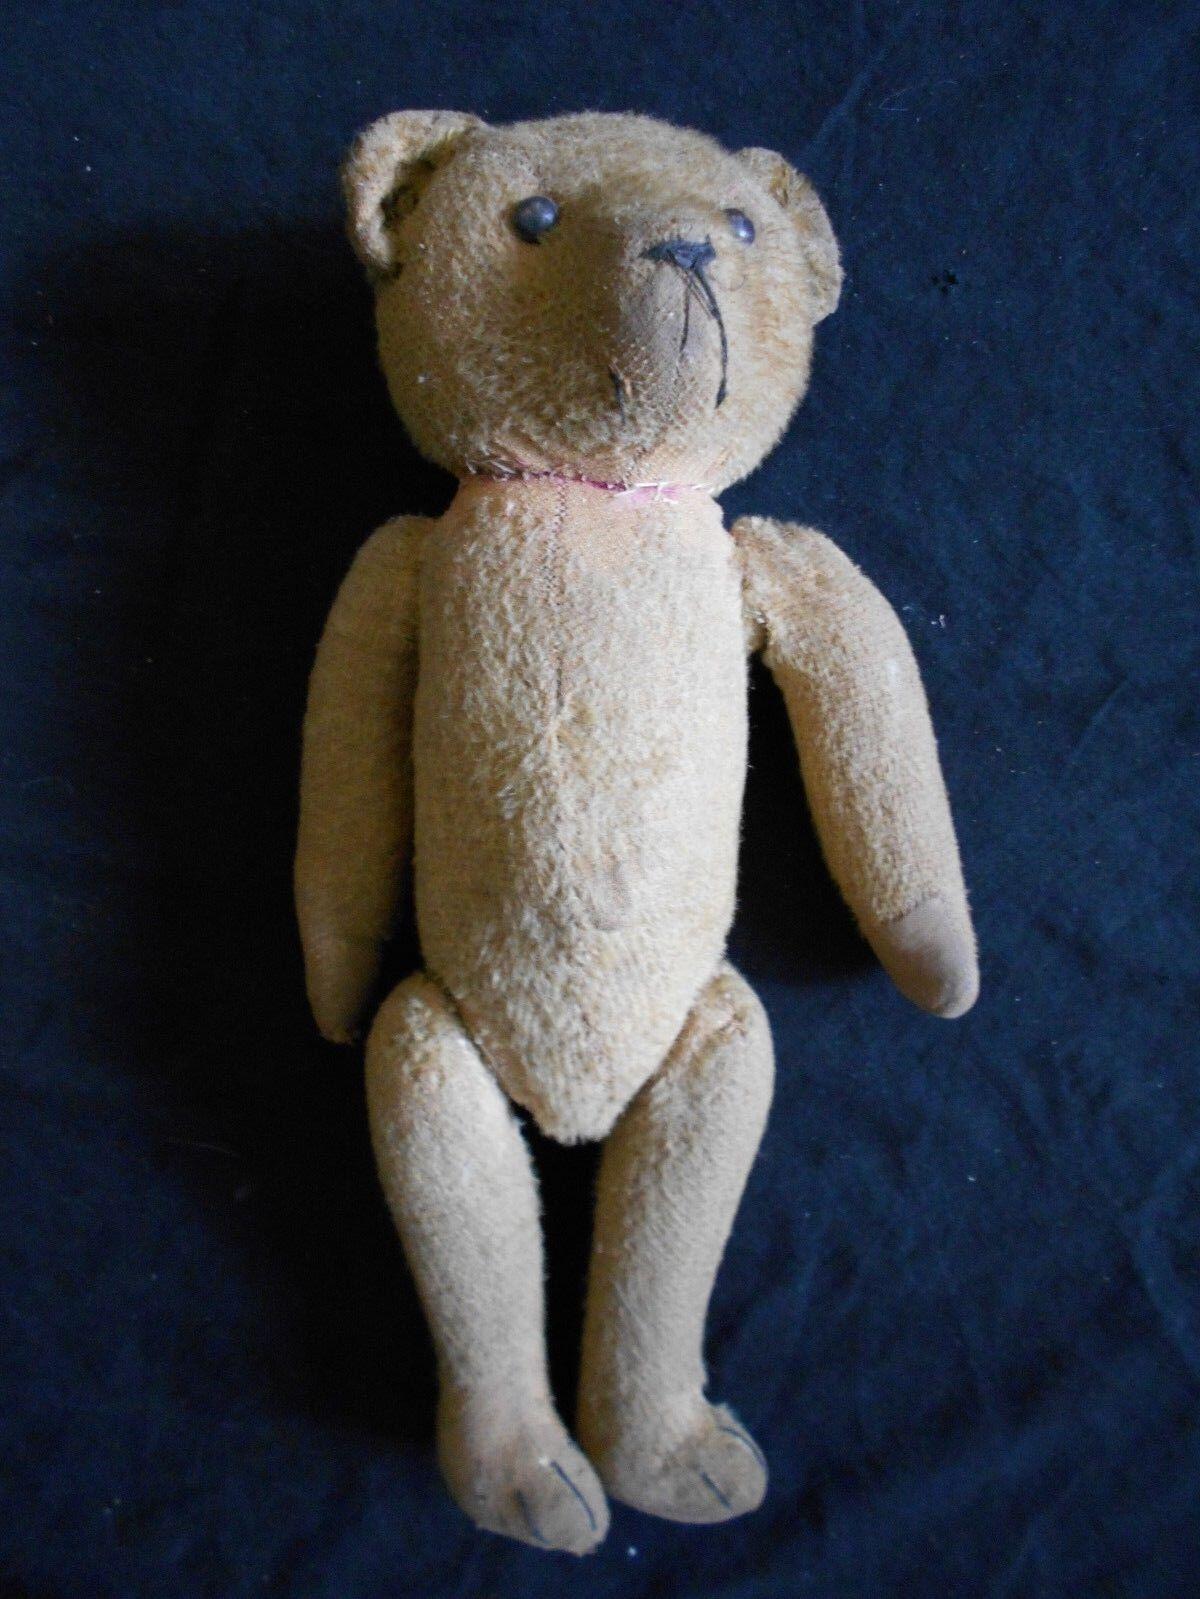 ANCIEN OURS  PELUCHE ARTICULE MECANISME TEDDY BEAR  JEU JOUET OLD TOYS